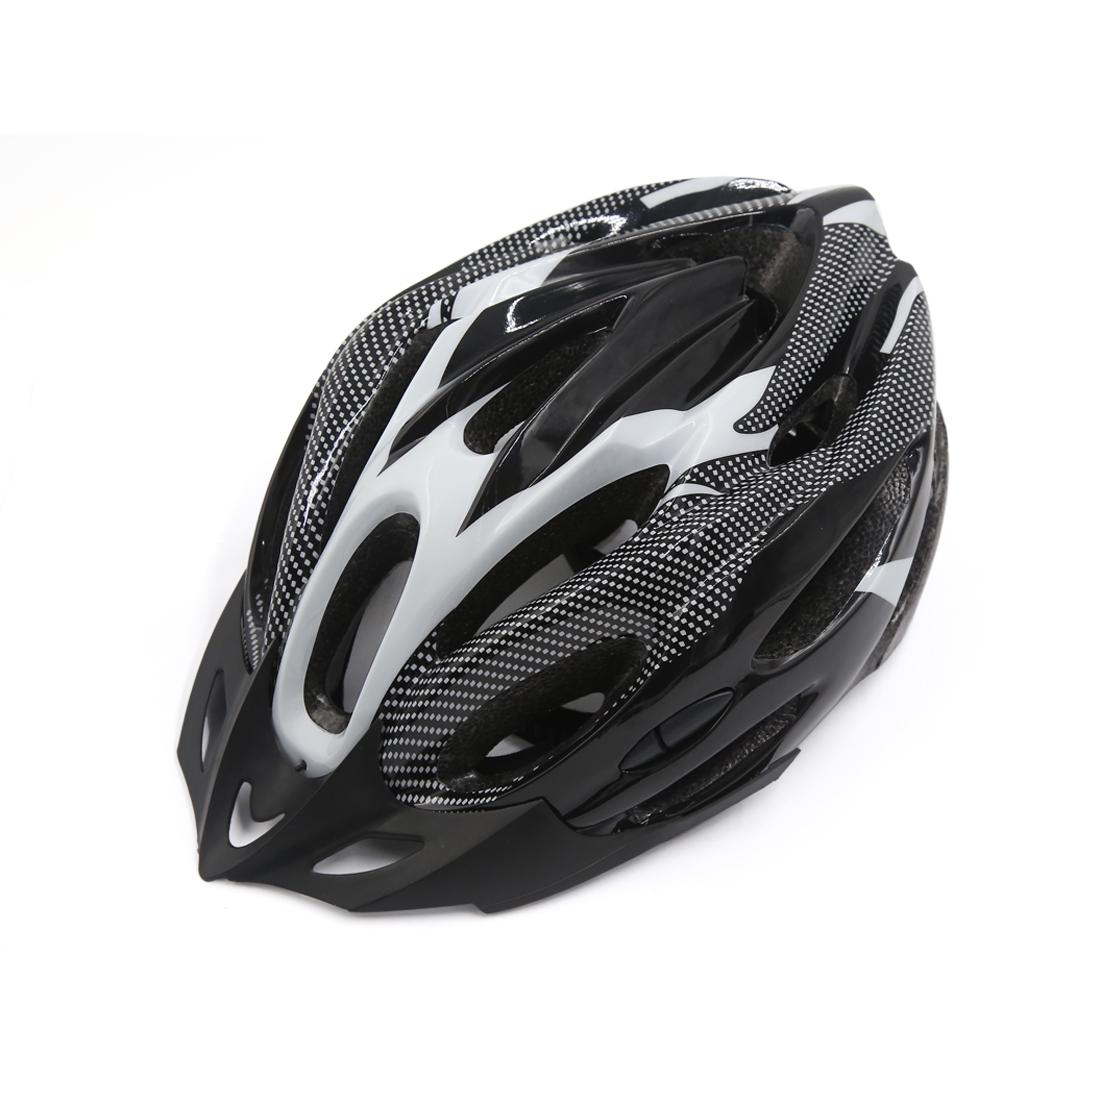 Carbon Fiber Pattern 21 Holes Cycling Bicycle Soprt Bike Helmet Visor White